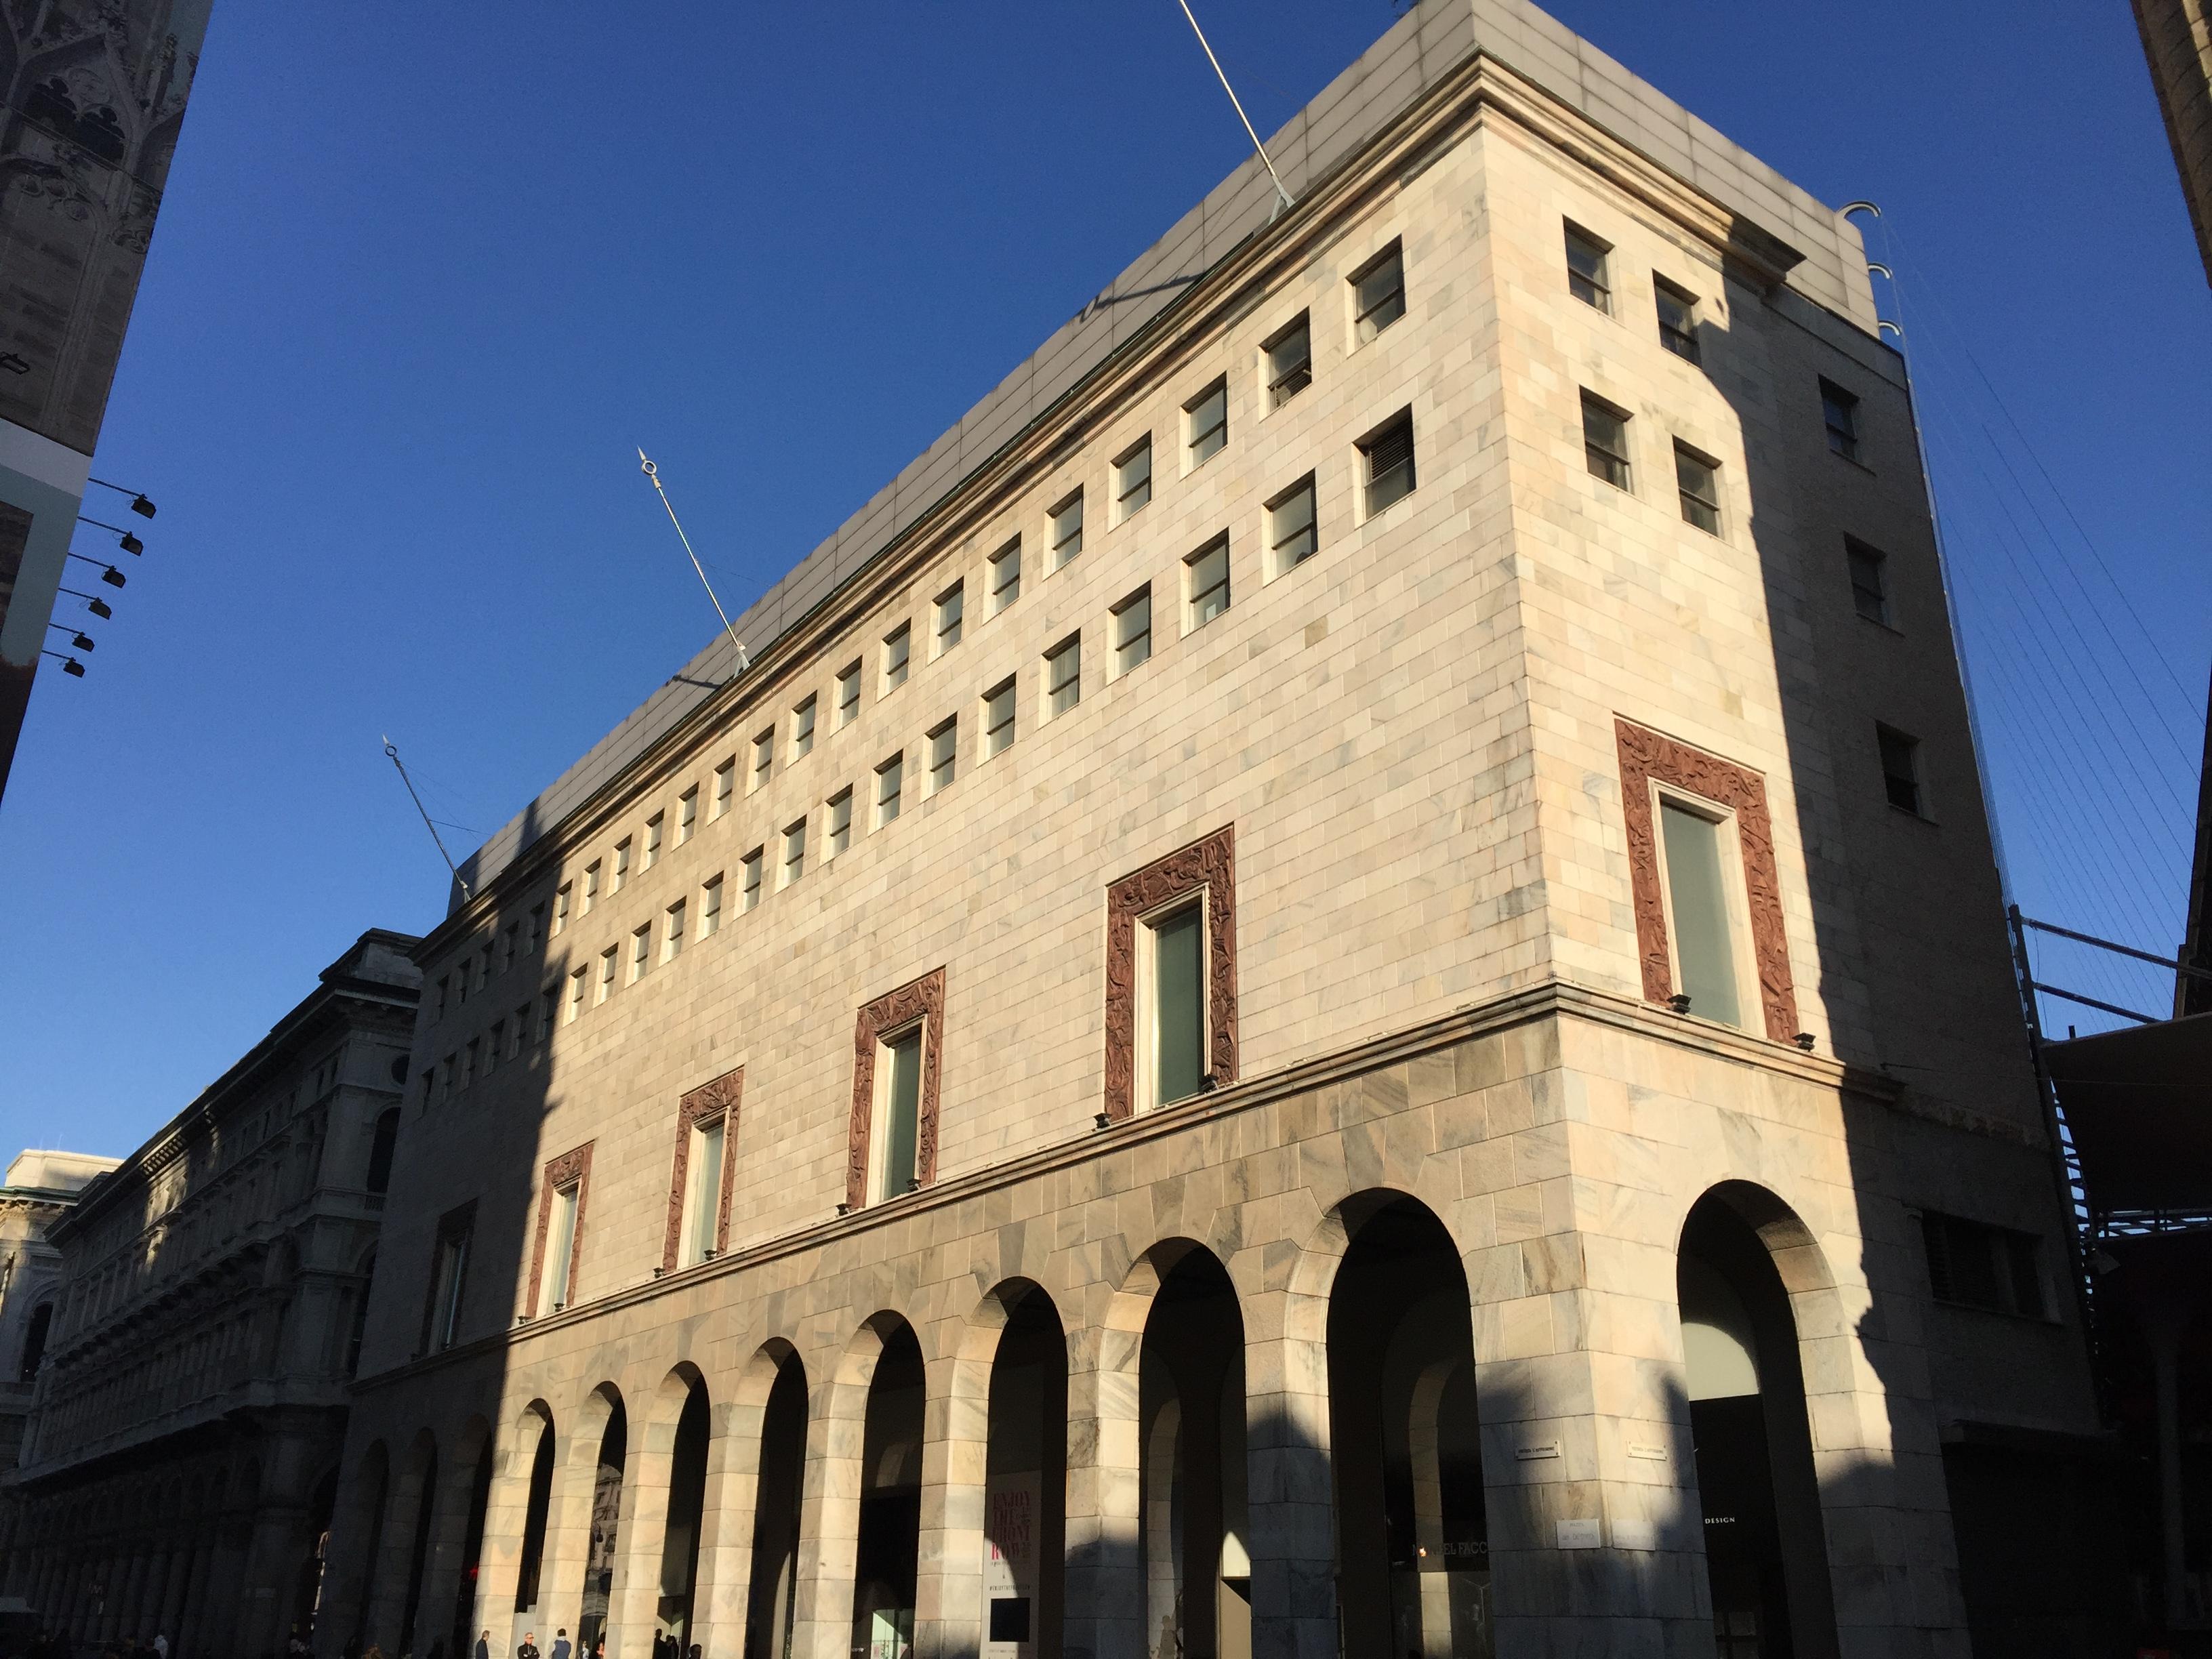 Rinascente Milan